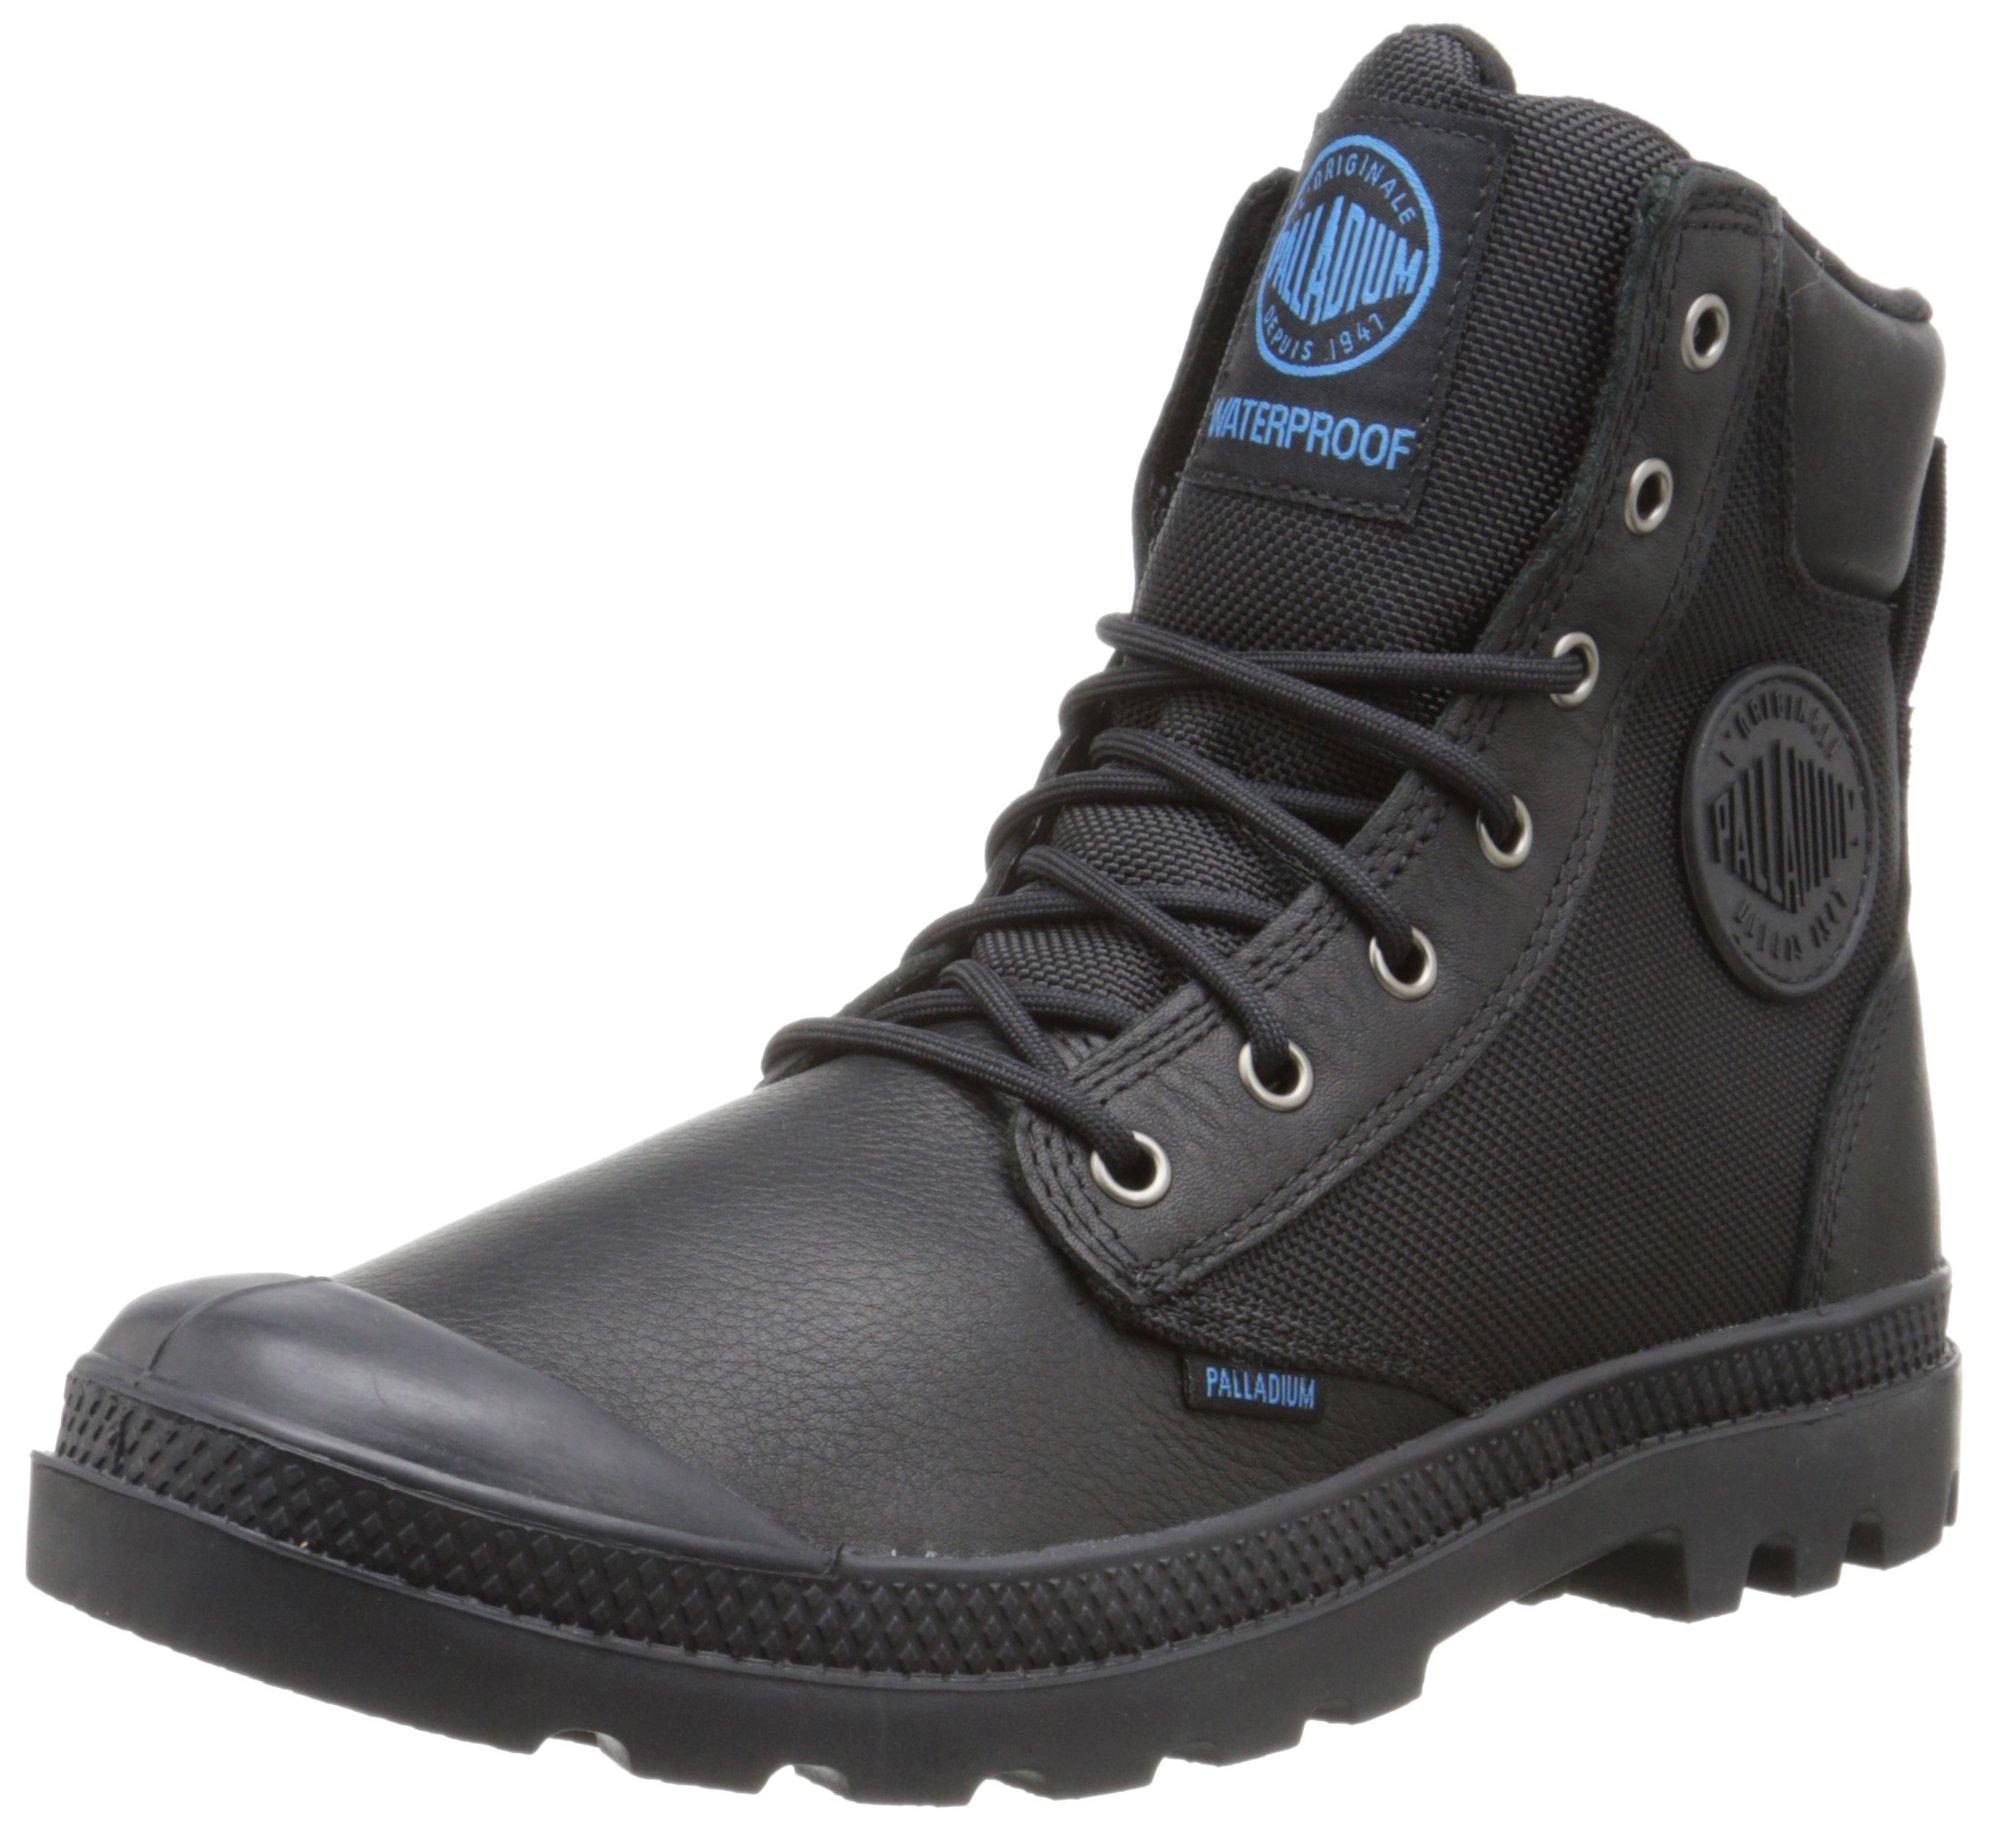 Palladium Boots Pampa Sport Cuff Wpn Waterproof Boots, Black, 4.5